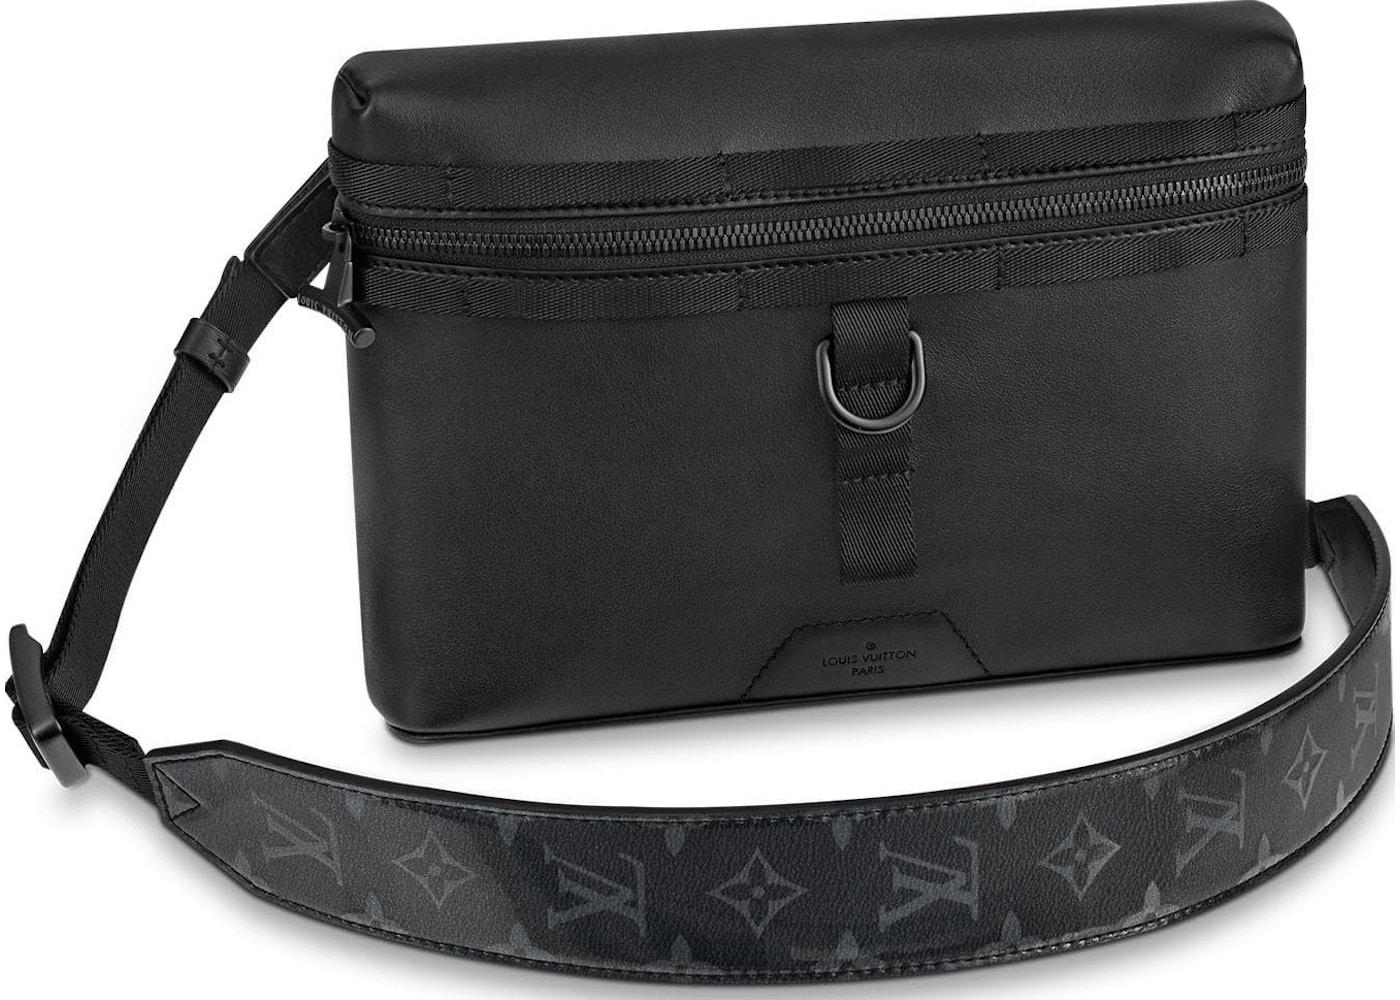 a35033817ece Louis Vuitton Messenger PM Dark Infinity. PM Dark Infinity